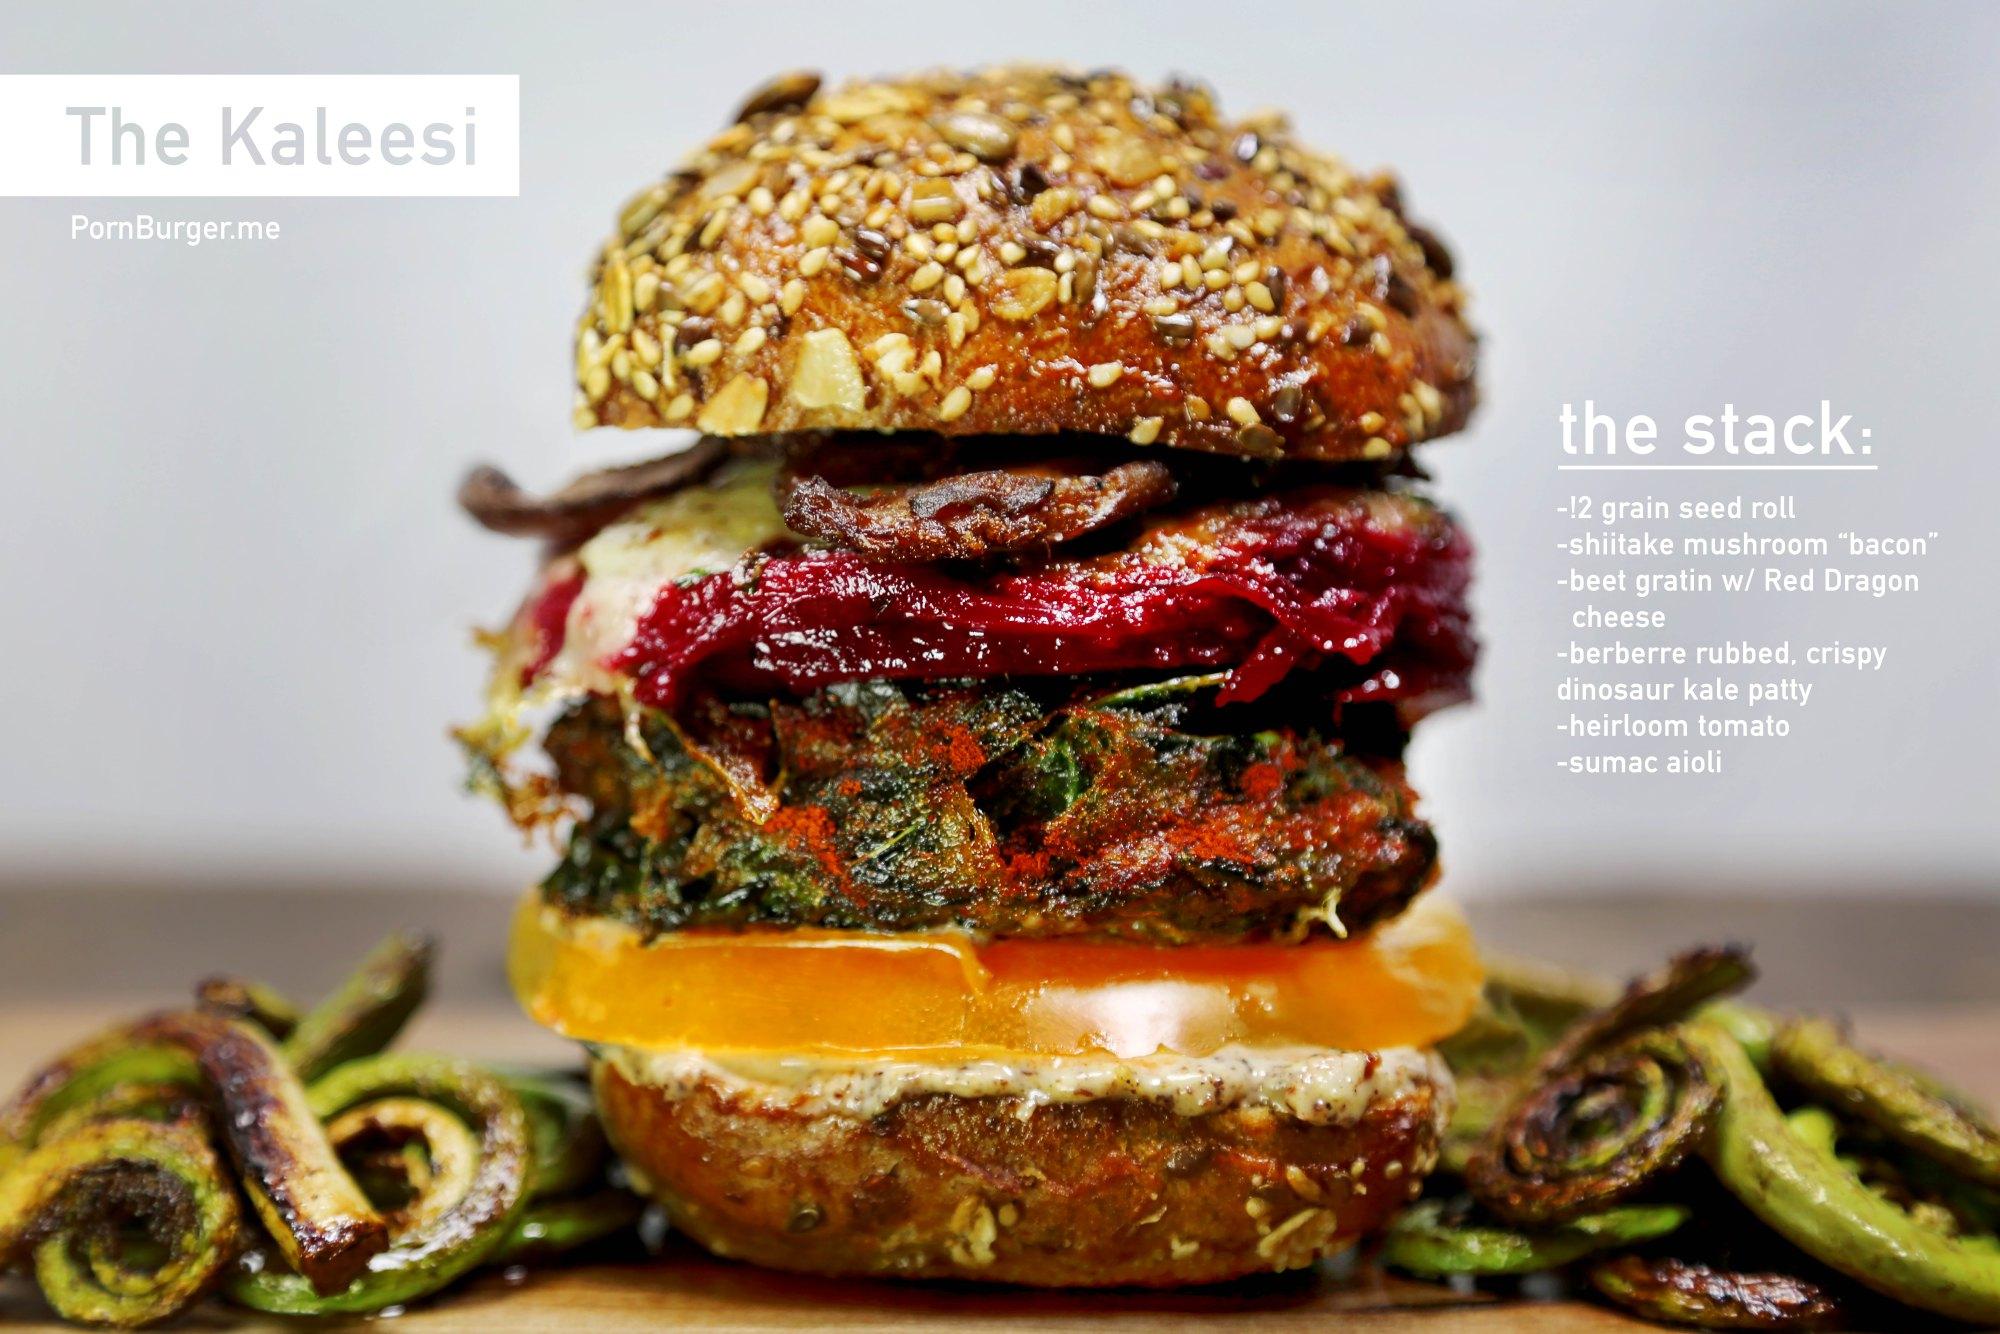 The Kaleesi Burger.